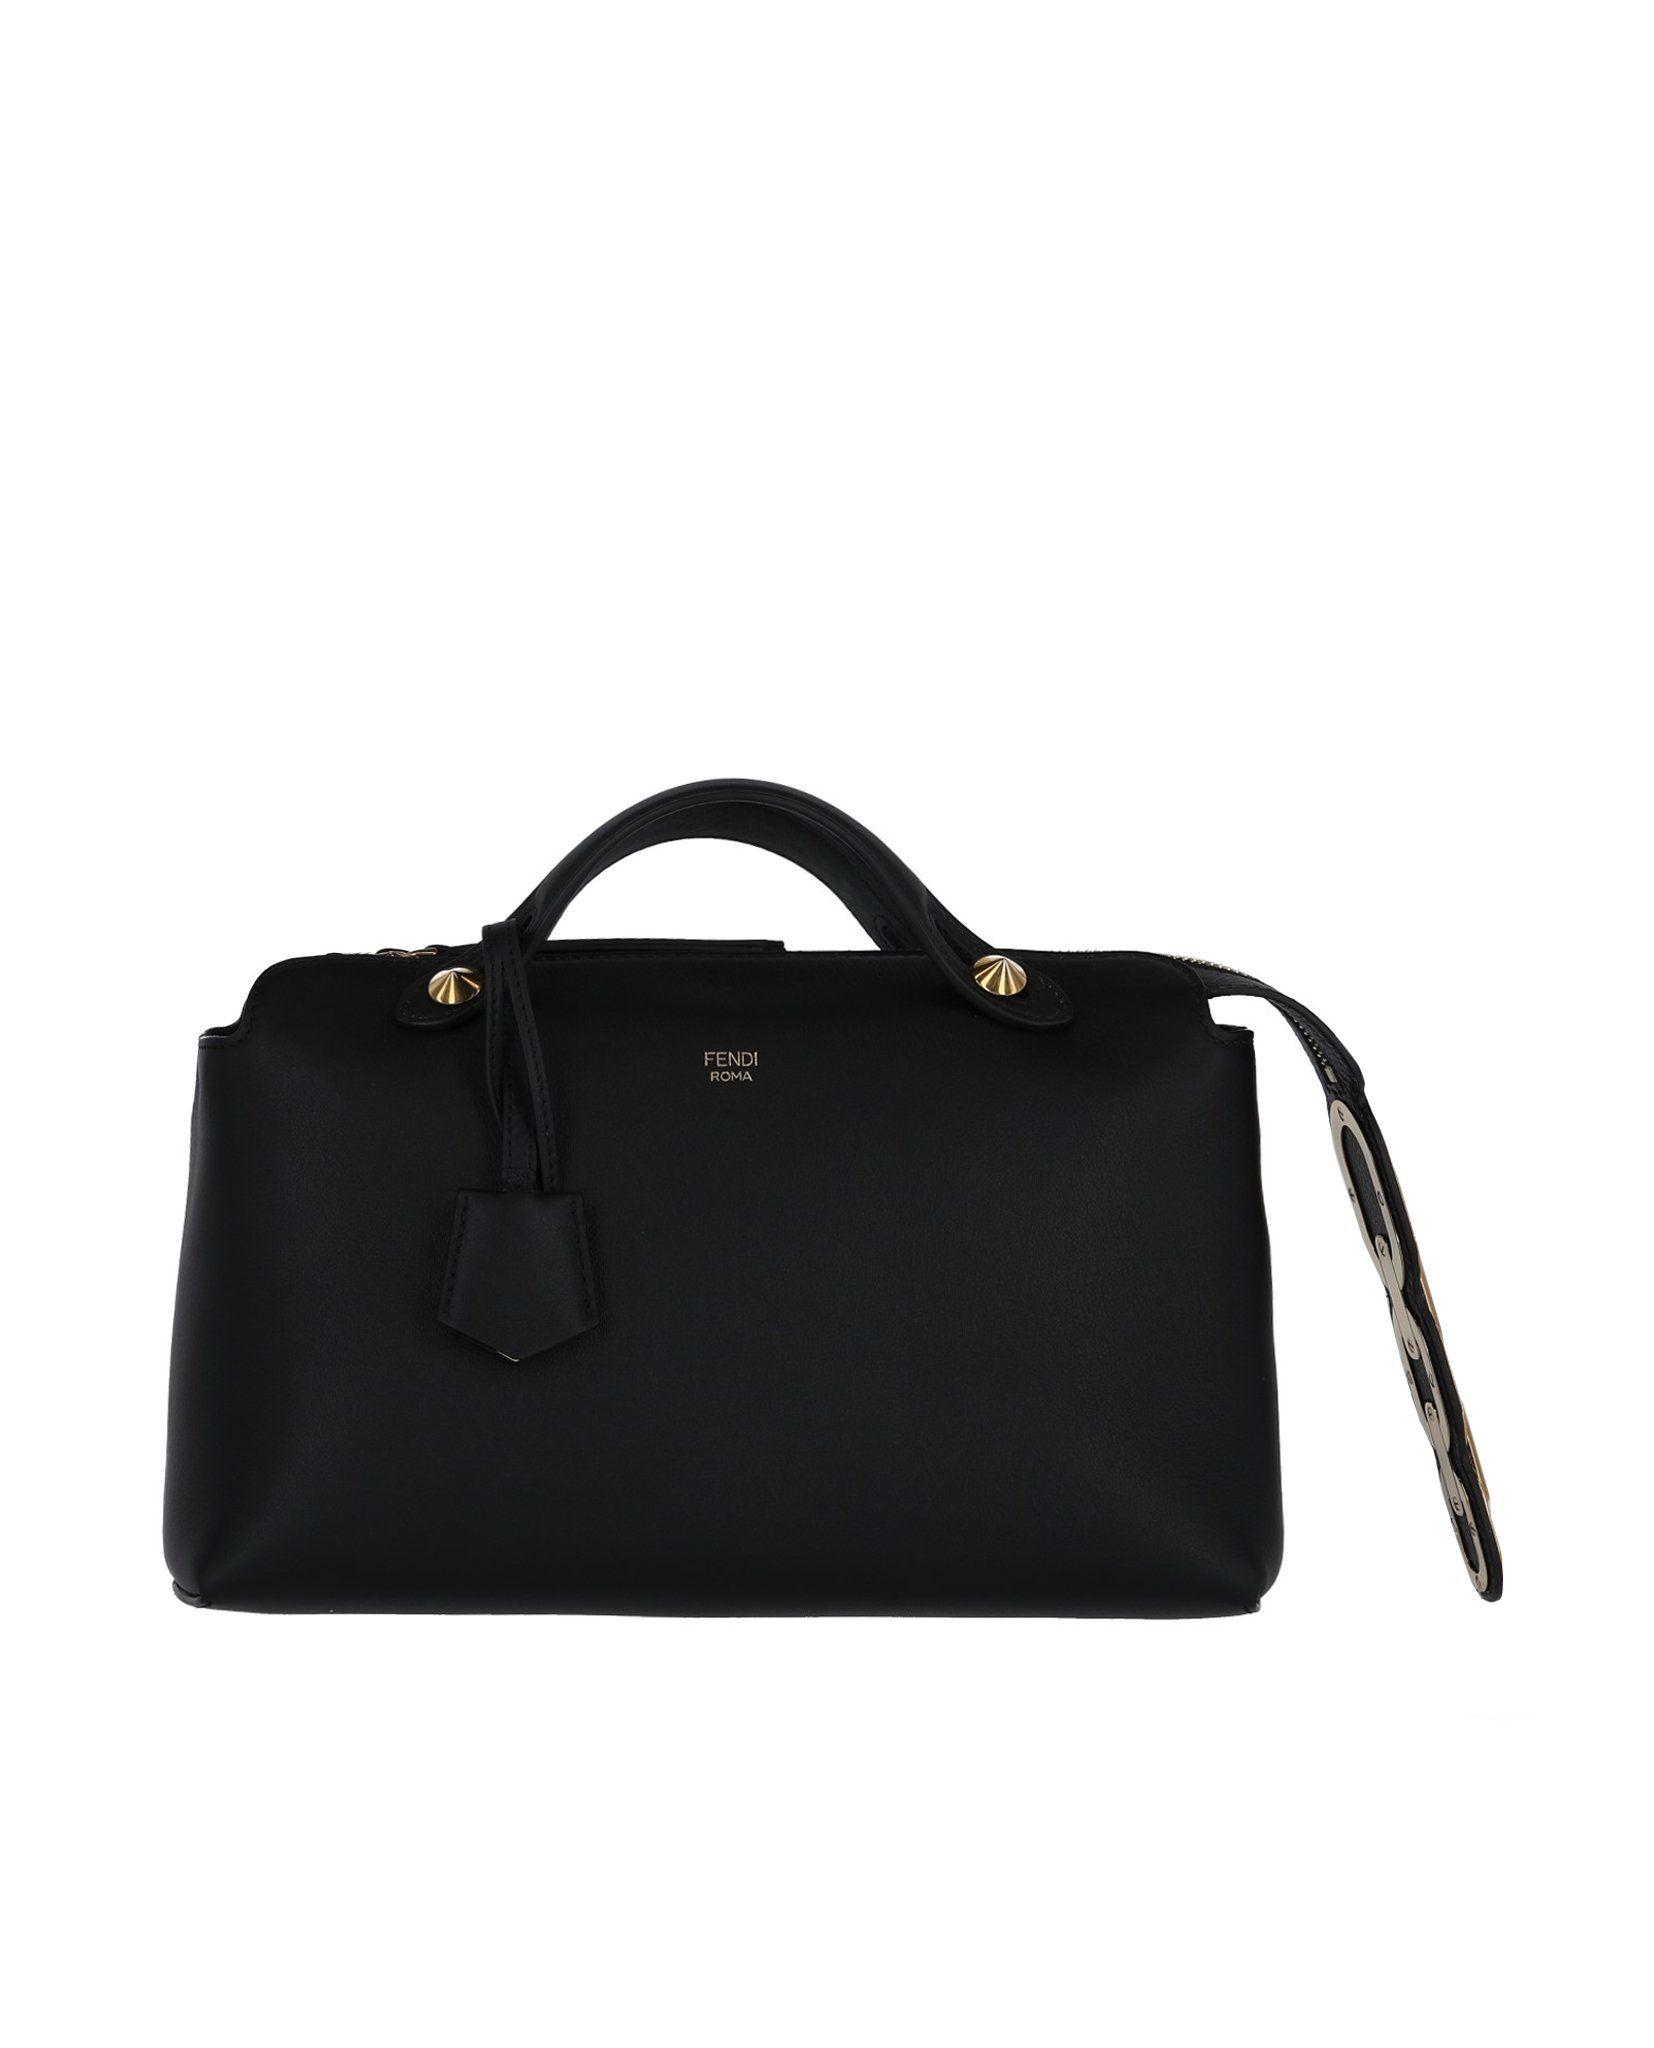 d8a50c2e4 Fendi By The Way Gold Edition Handbag   Designer Handbags On Sale   Handbags  For Women   Luxury Designer Handbags #madaluxevault #fendi